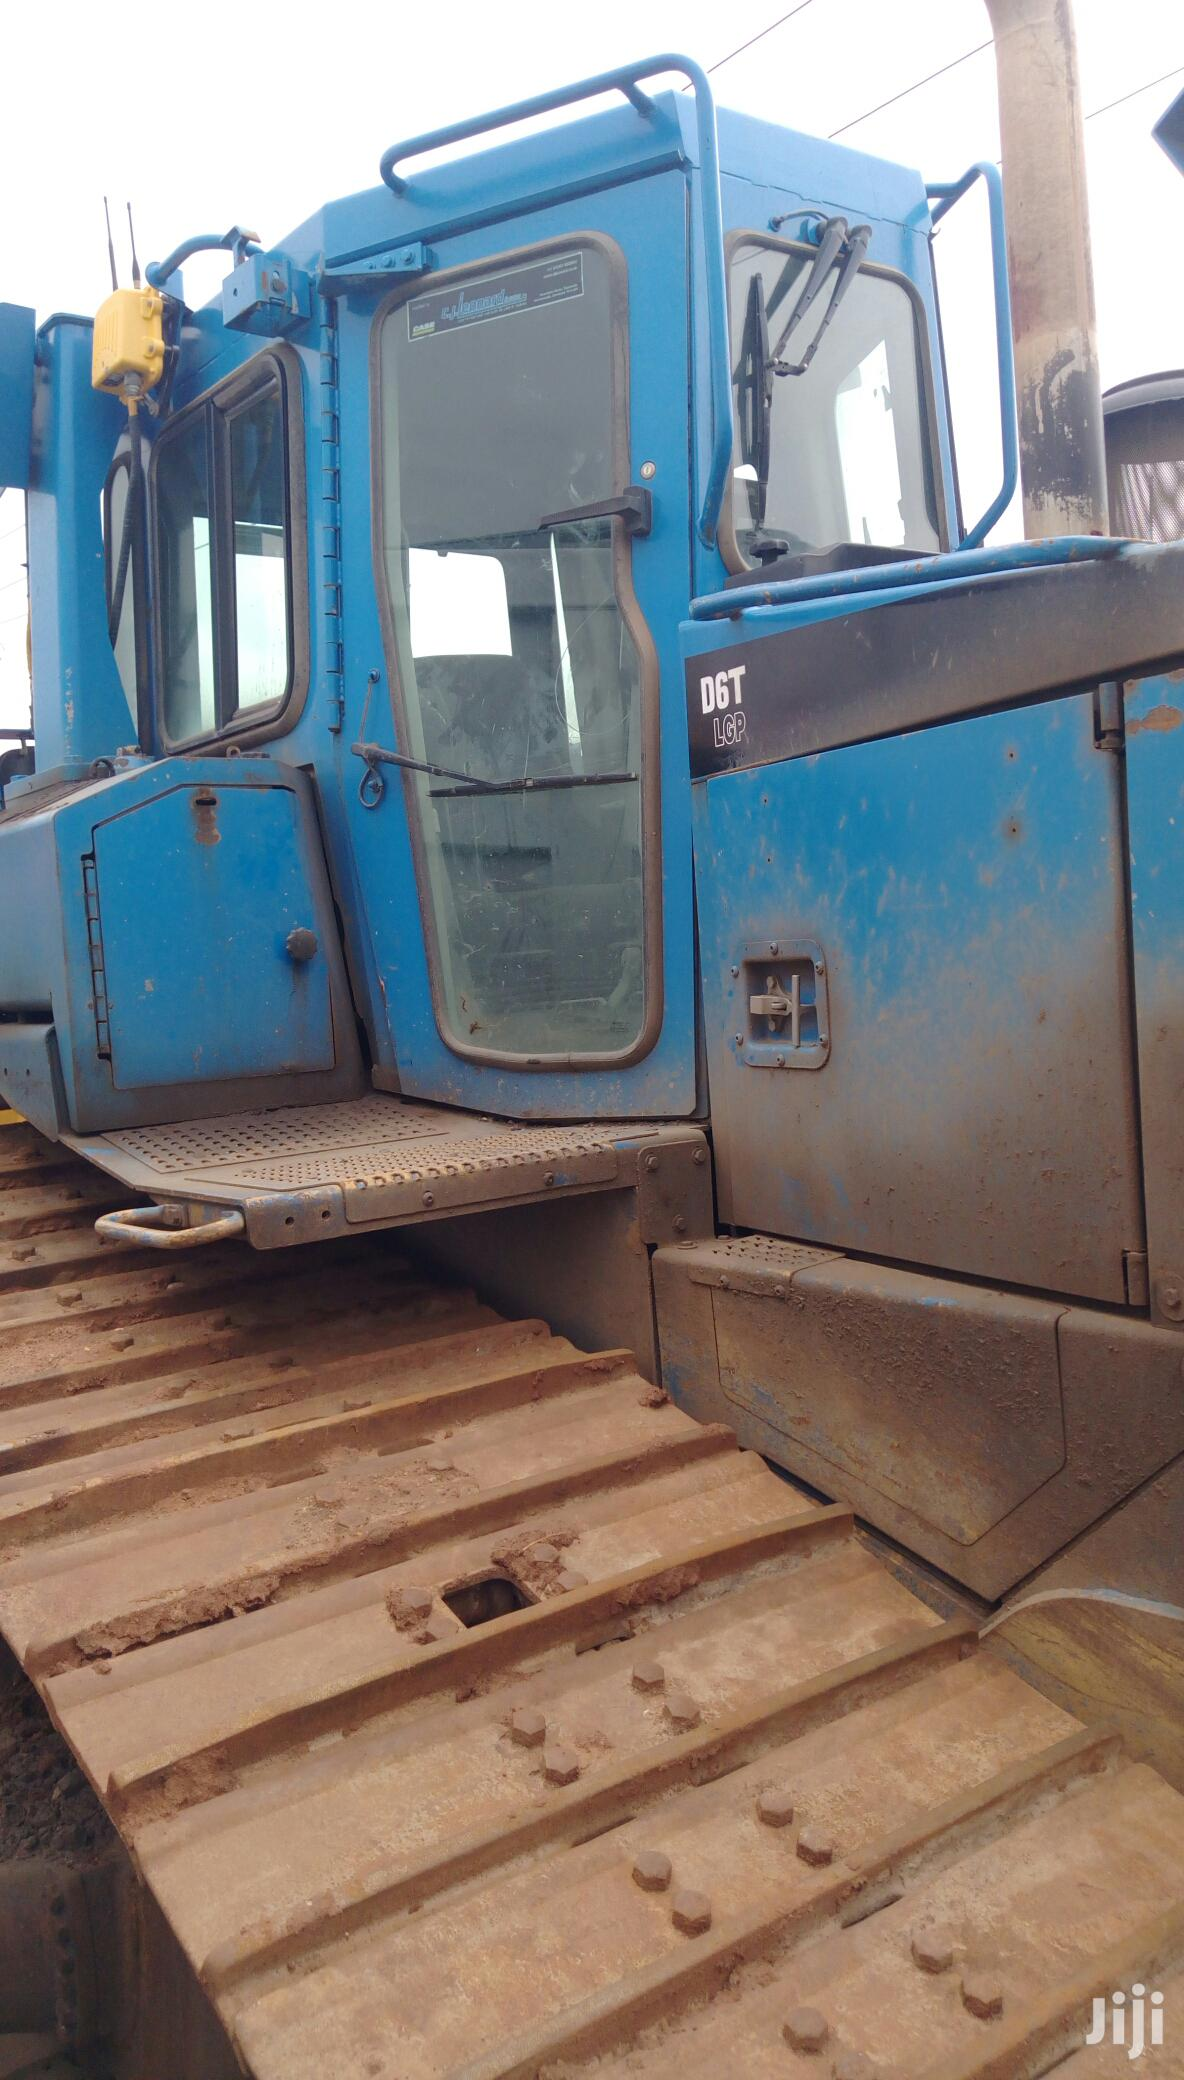 Caterpillar D6T | Heavy Equipment for sale in Ikeja, Lagos State, Nigeria